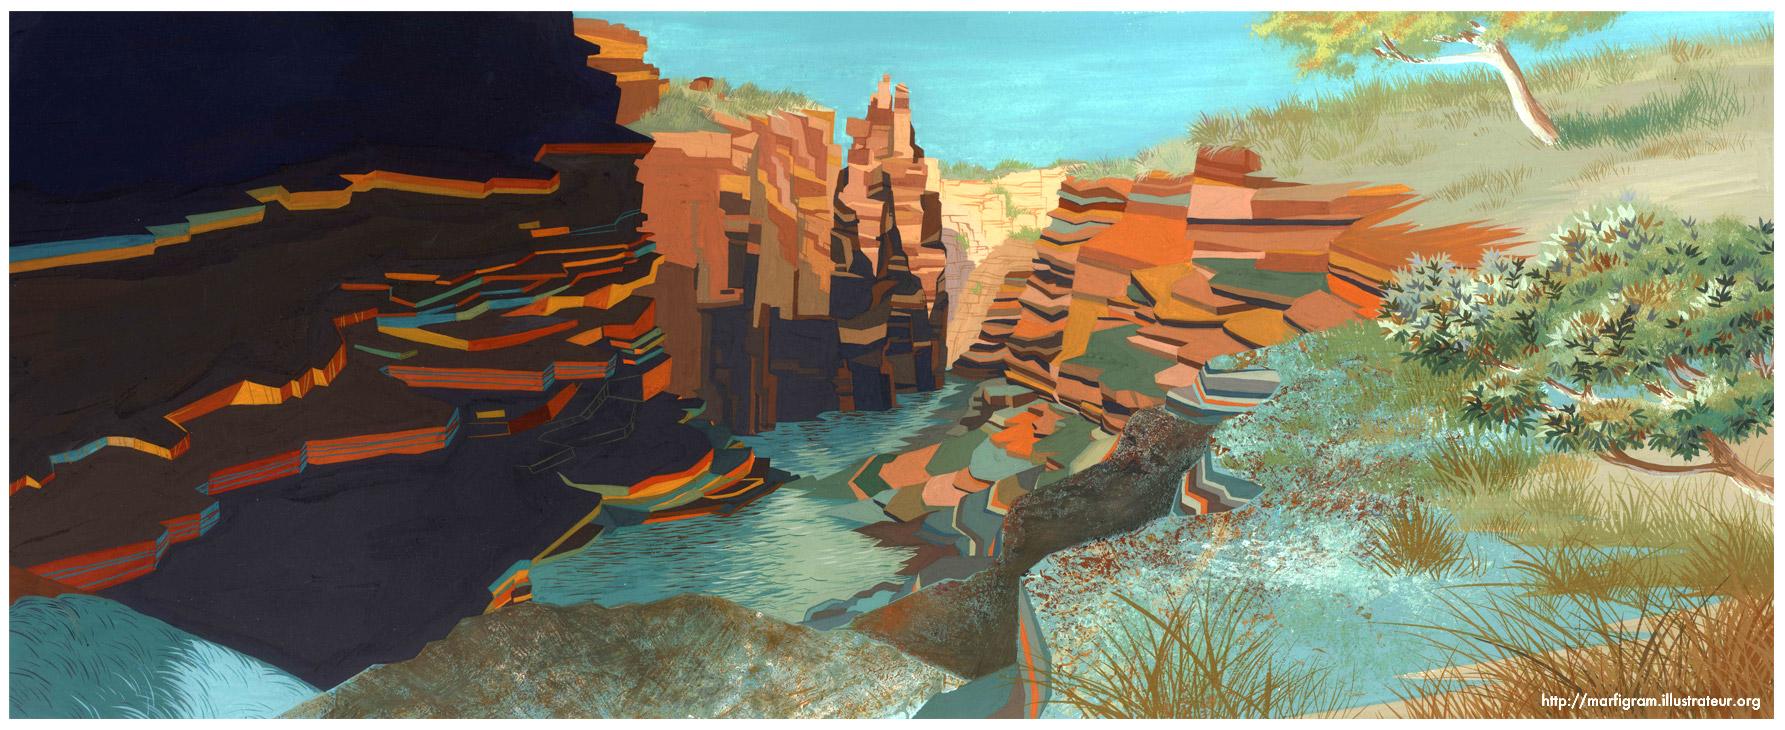 Joffre Falls (Australia) by Marfigram